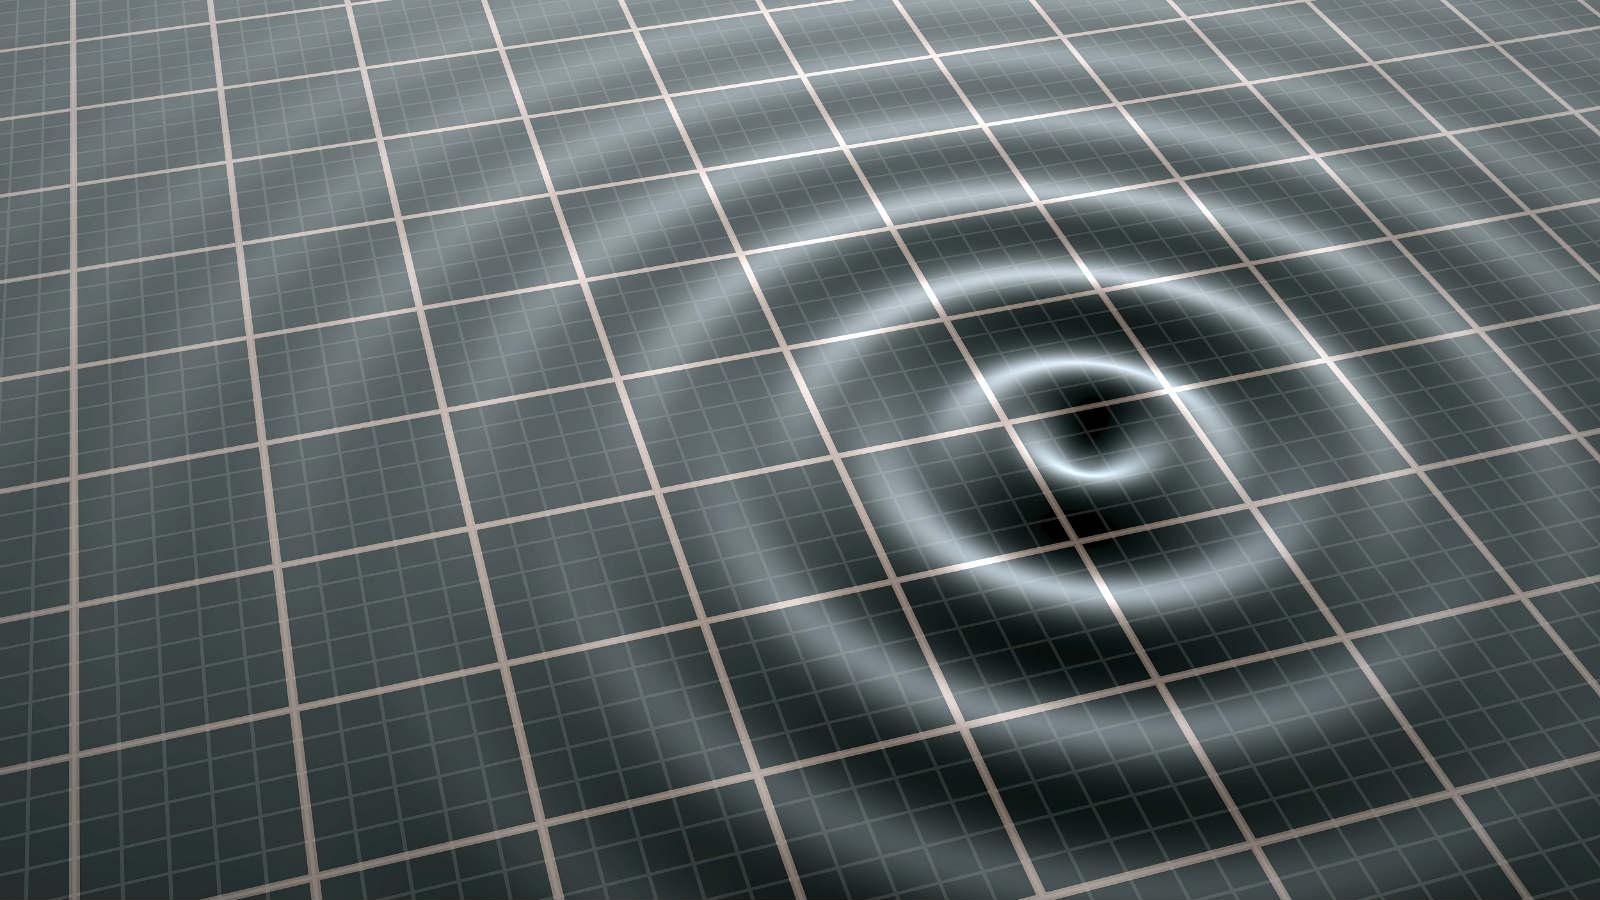 5.5-magnitude quake hits 114km SW of Puerto Madero, Mexico: USGS